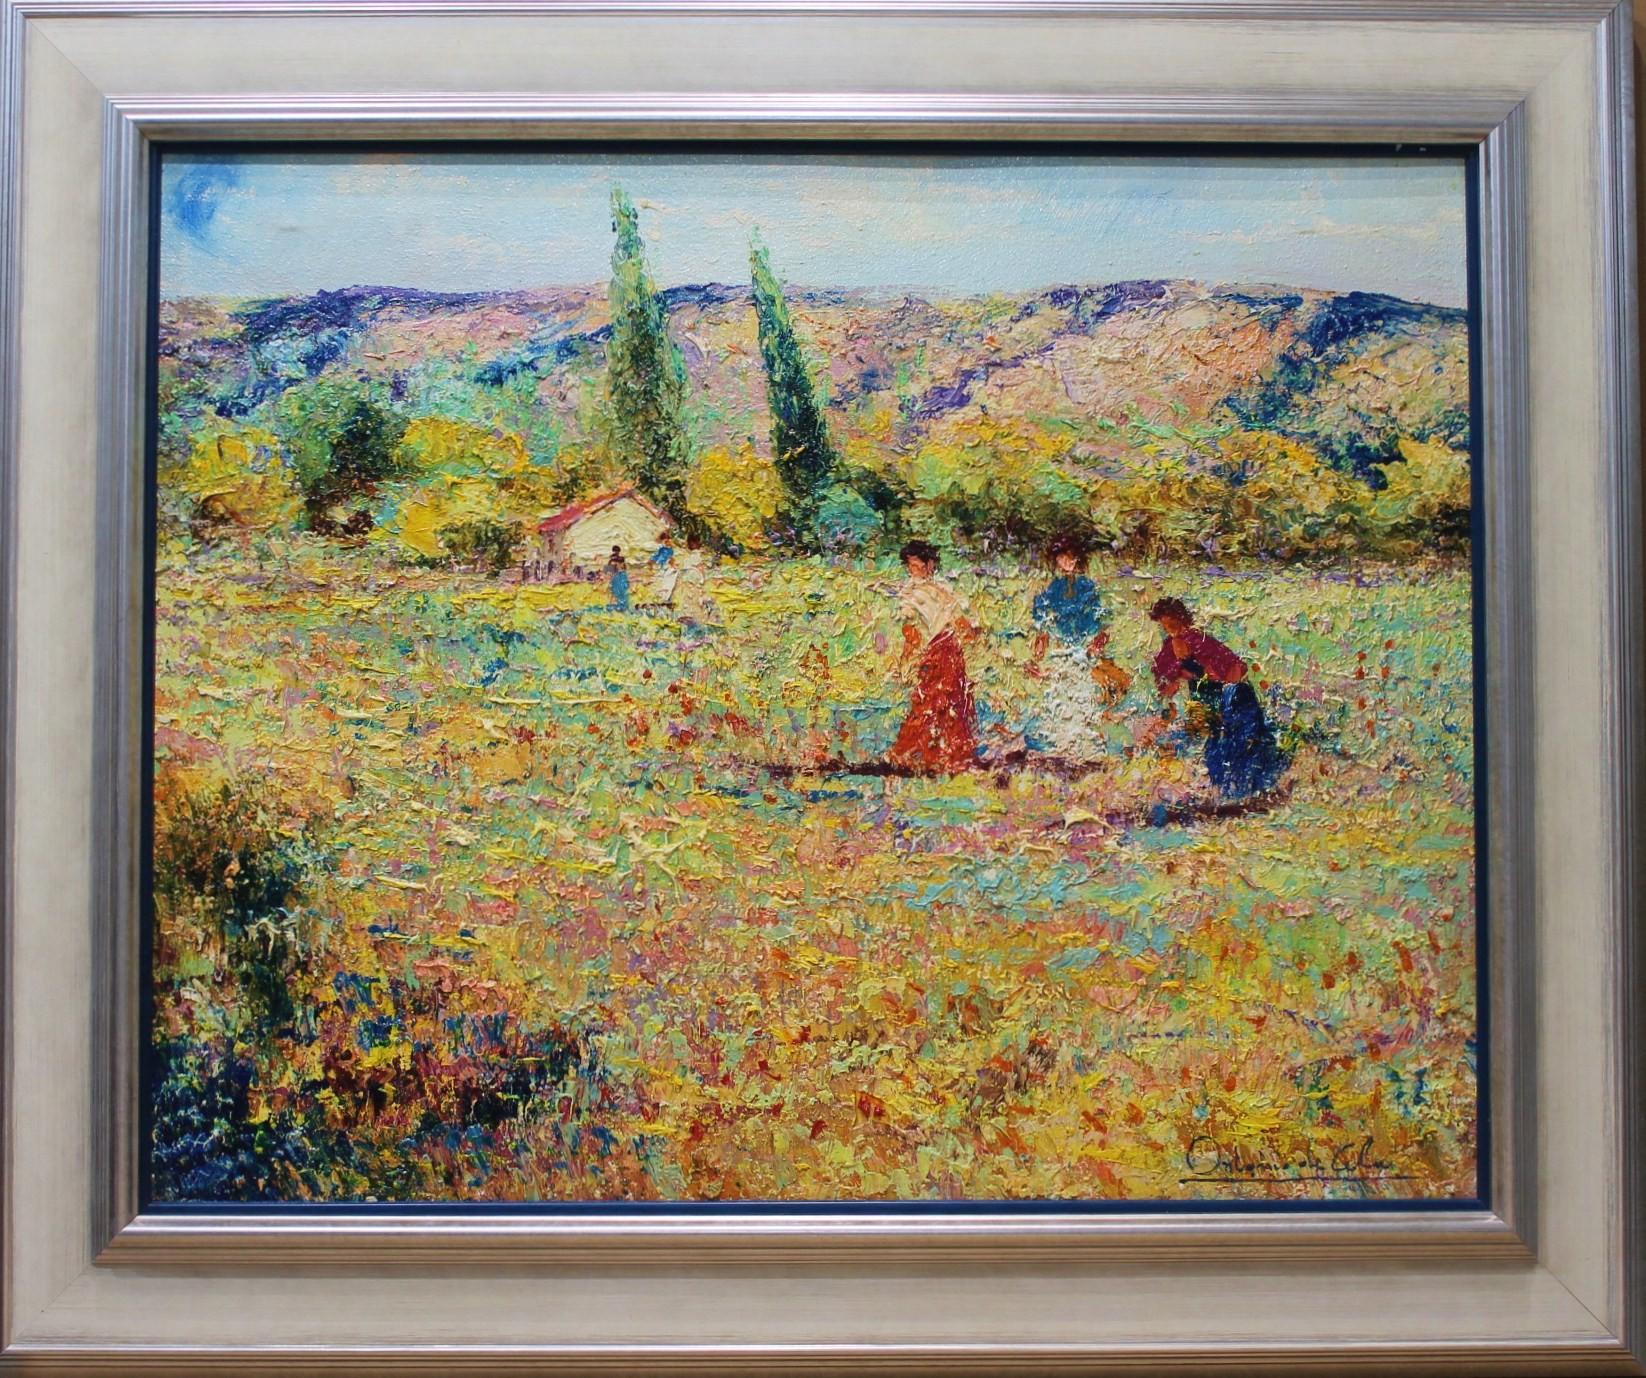 Antonio de Cela: Paisaje impresionista